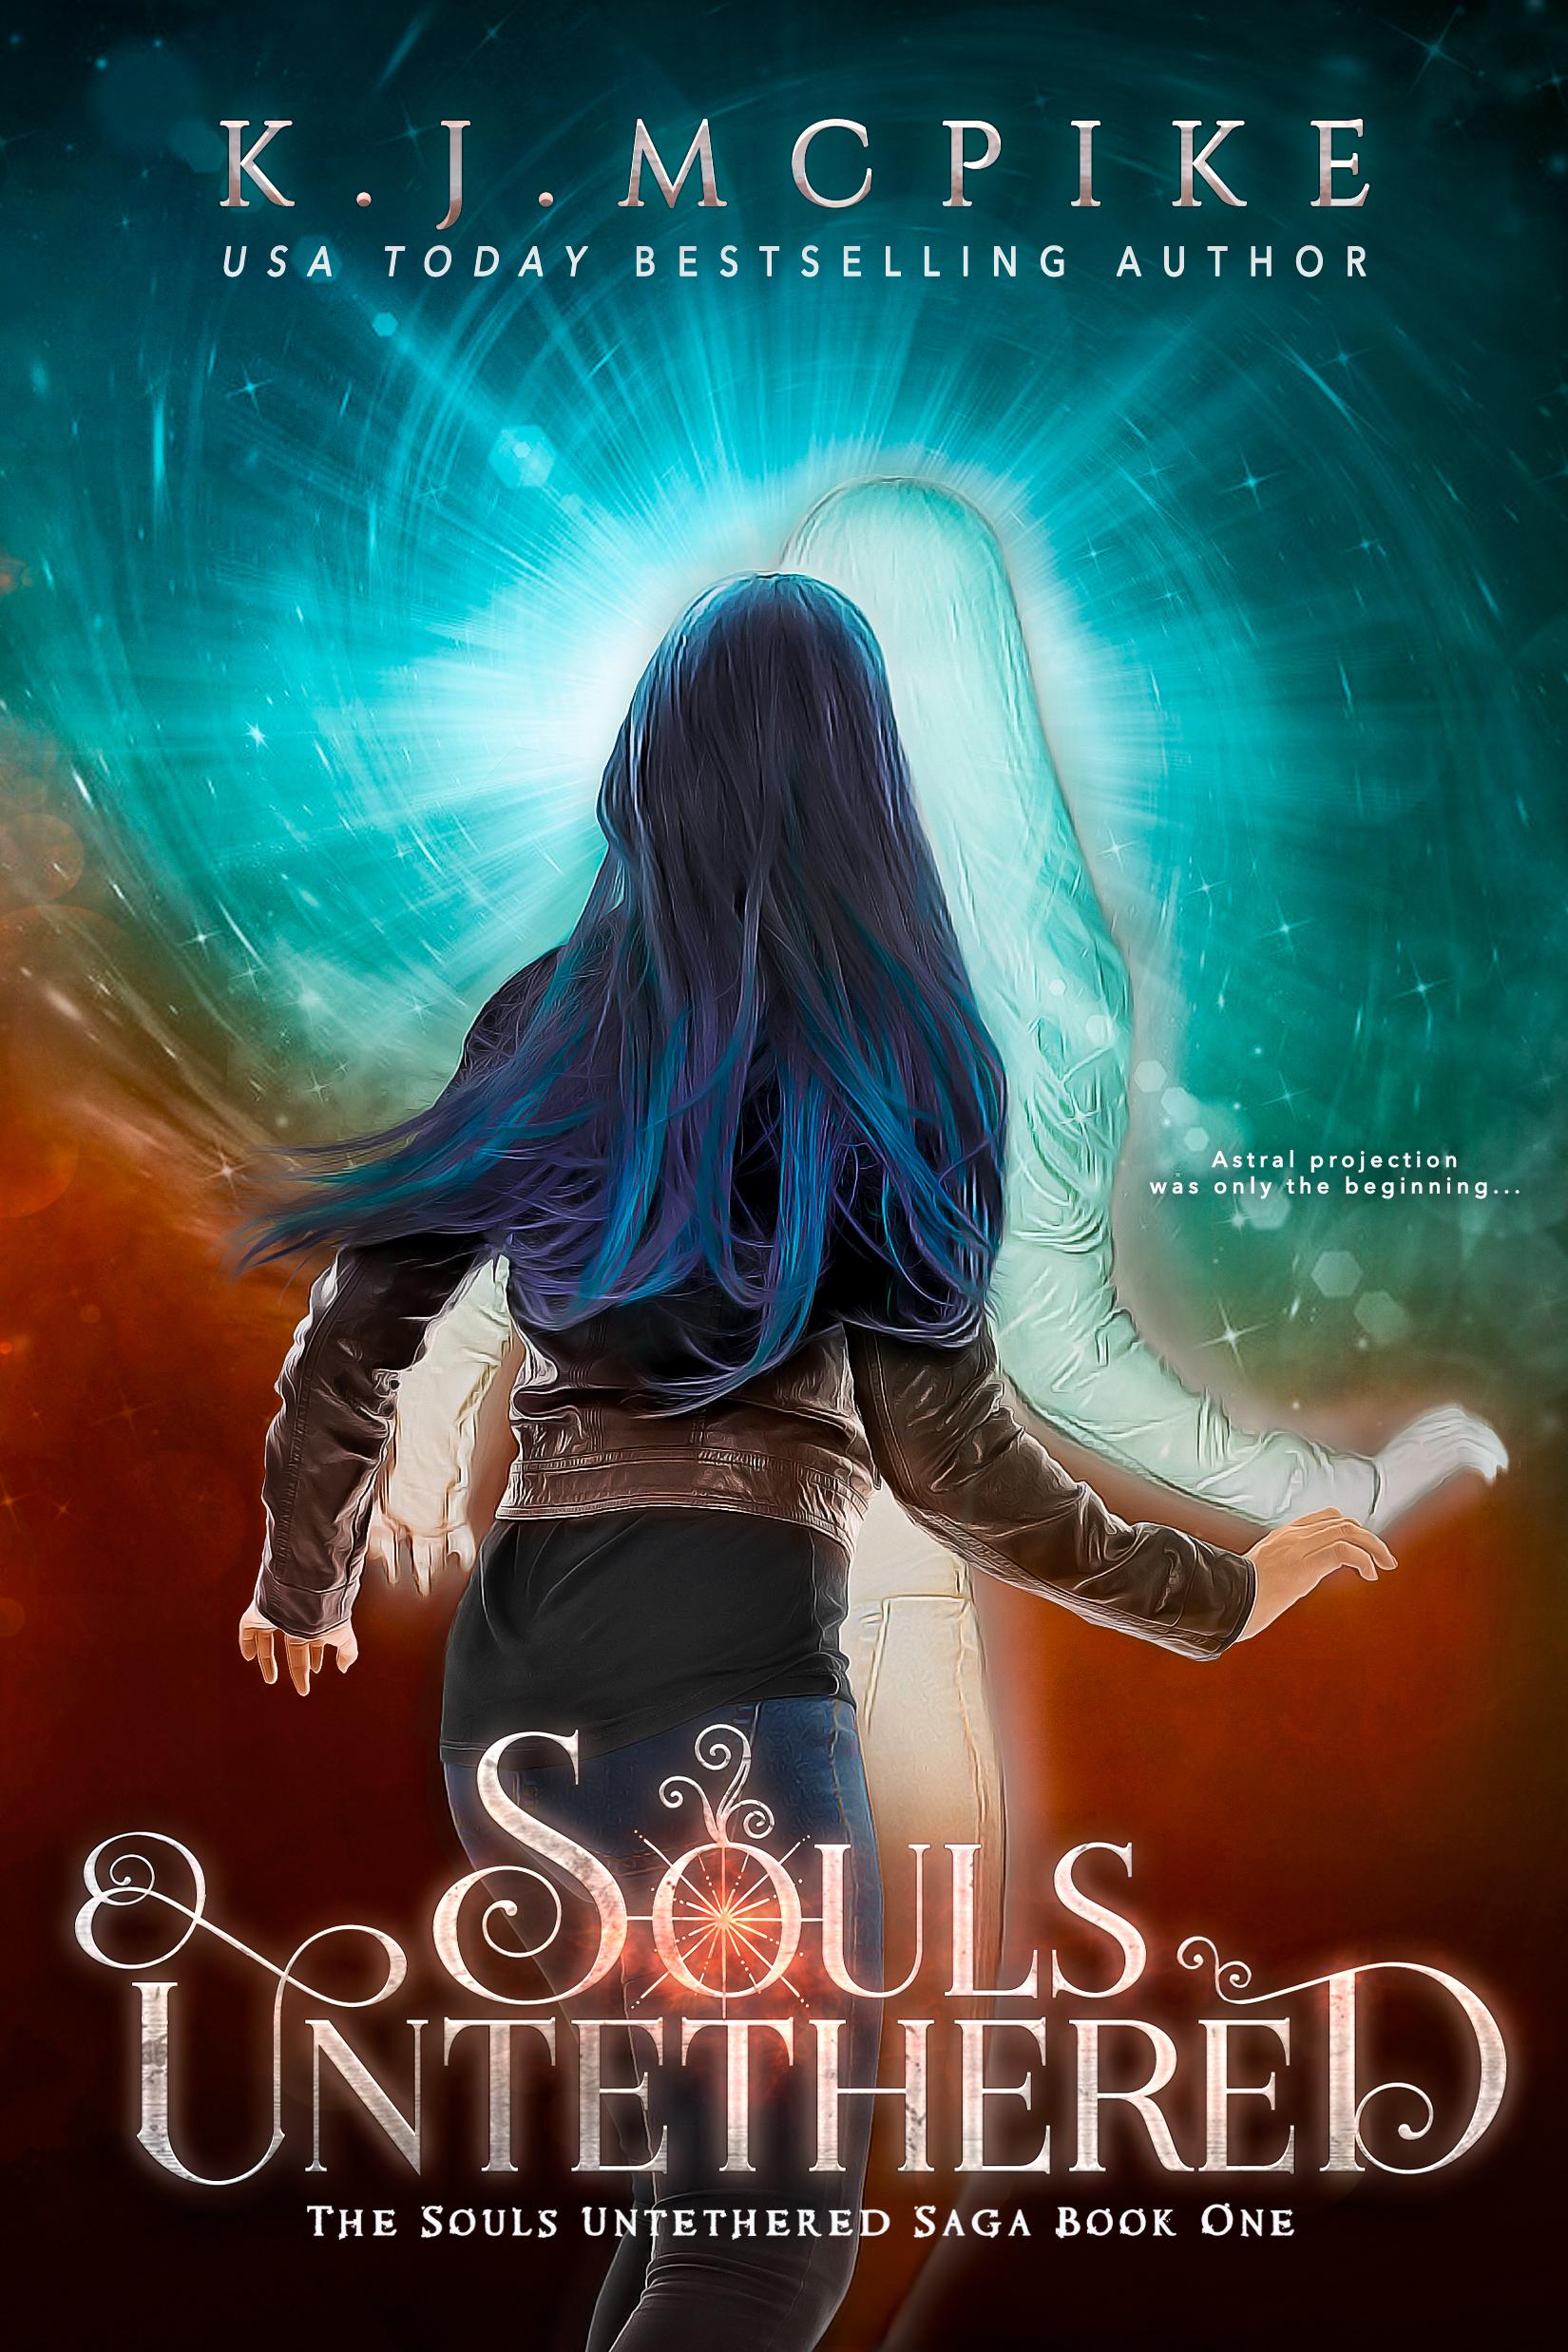 Souls Untethered (The Souls Untethered Saga 1) - K